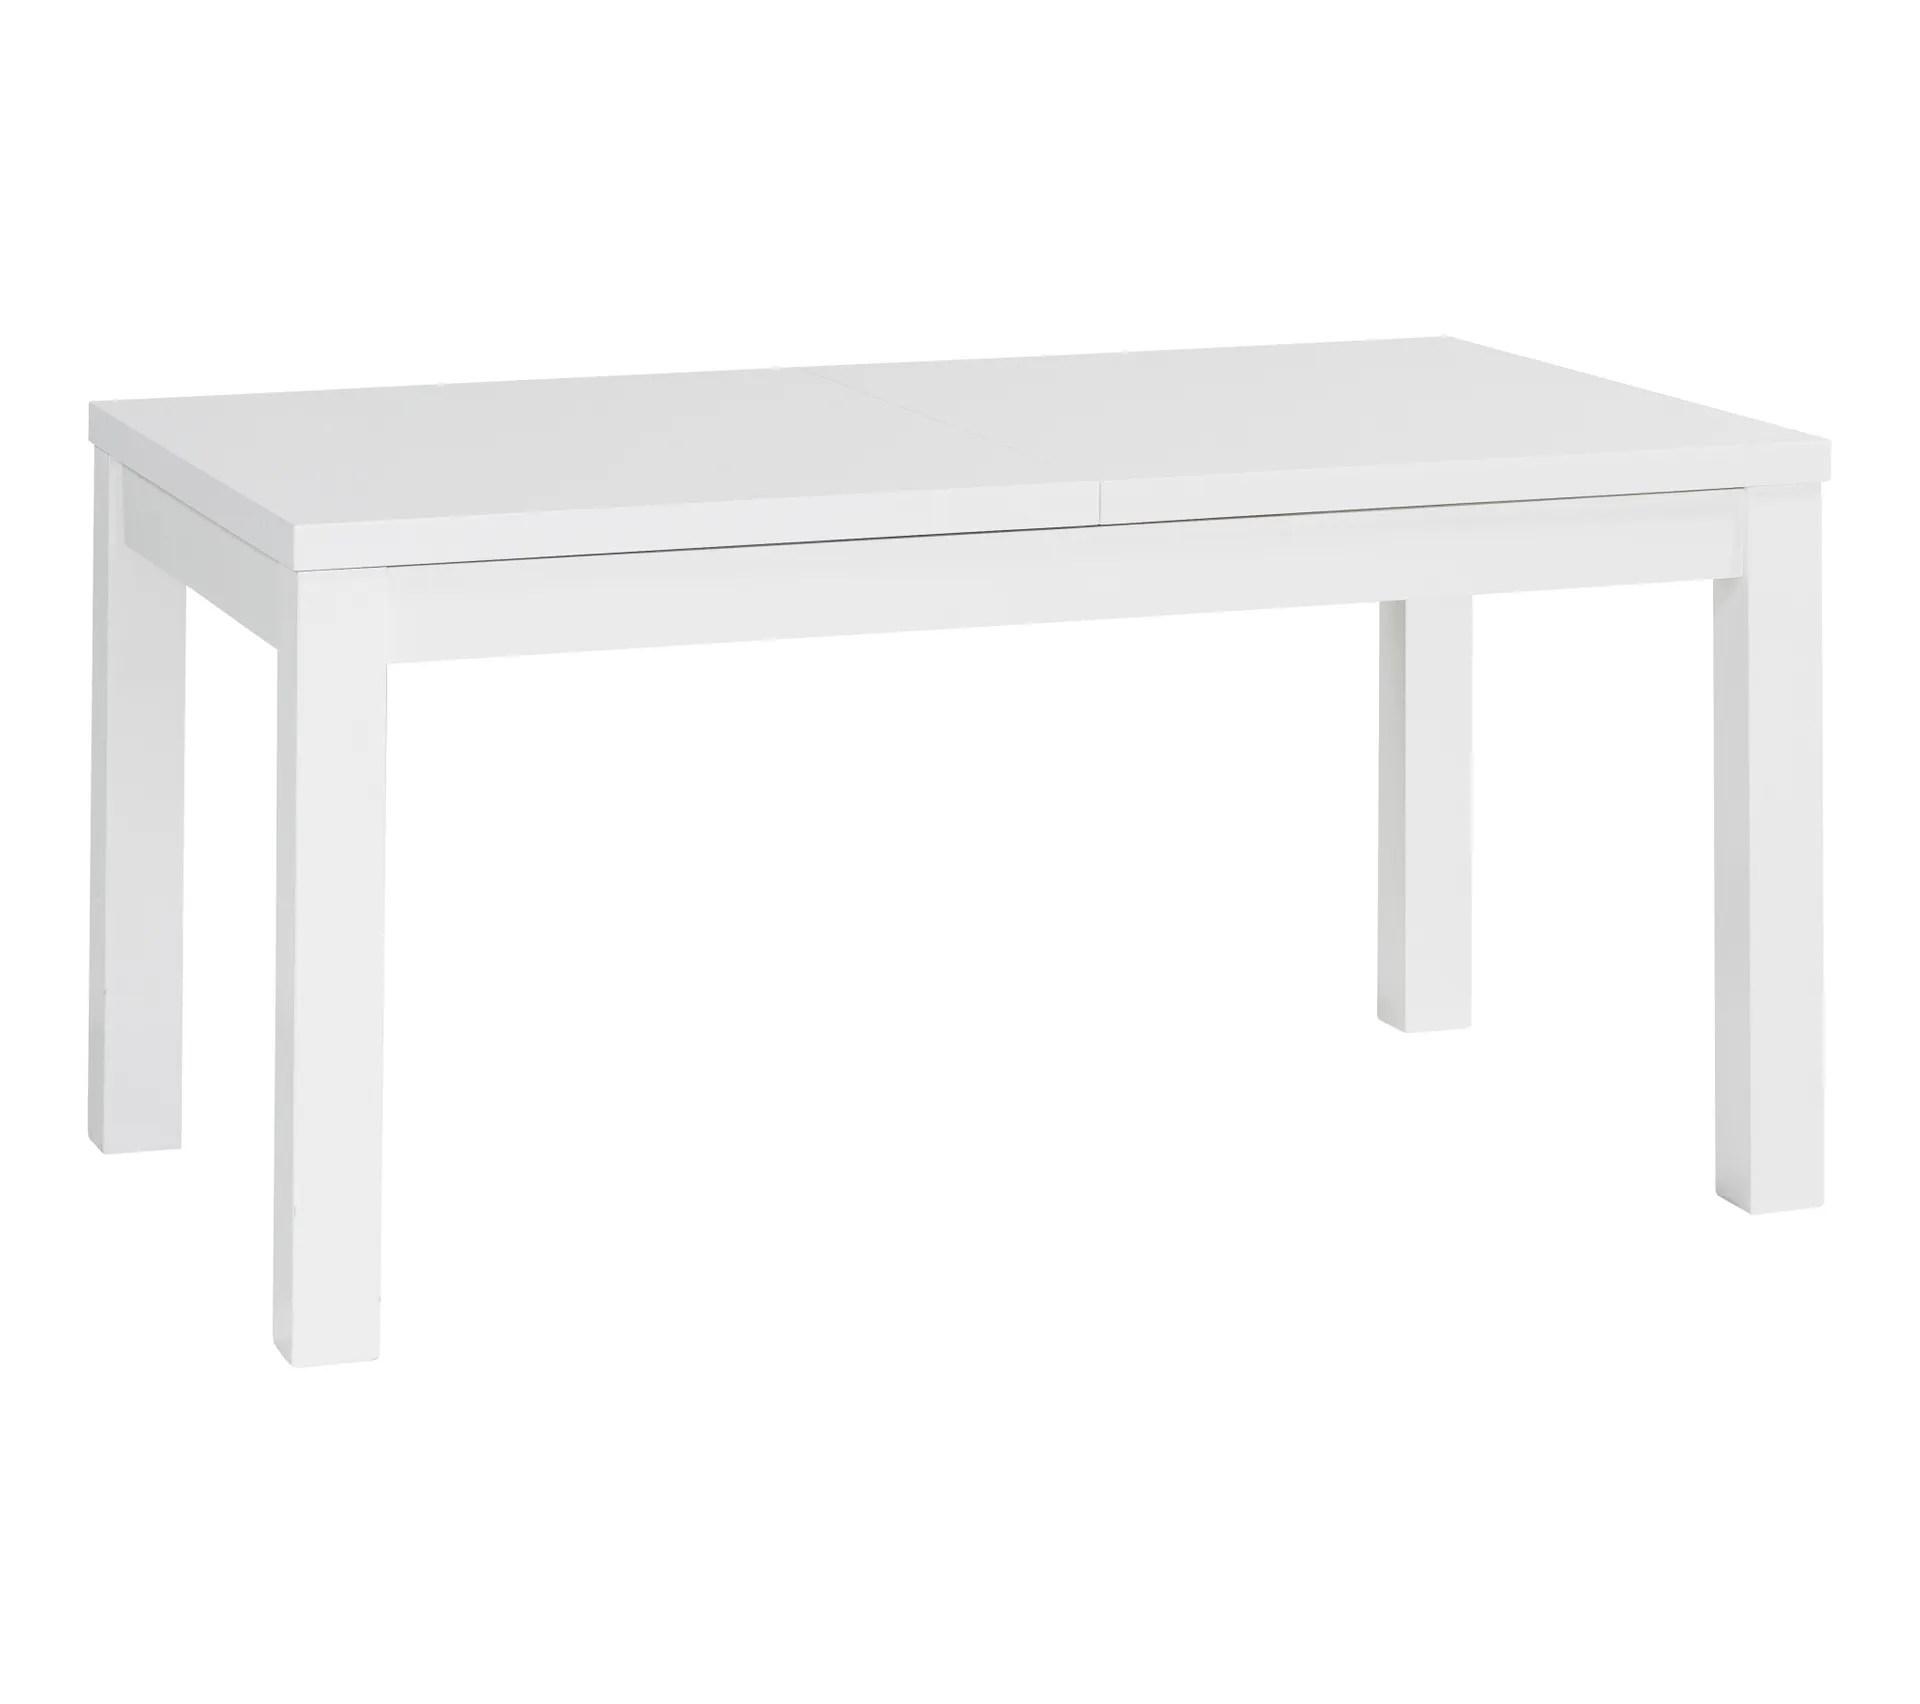 table l 160 cm urbana 3 blanc